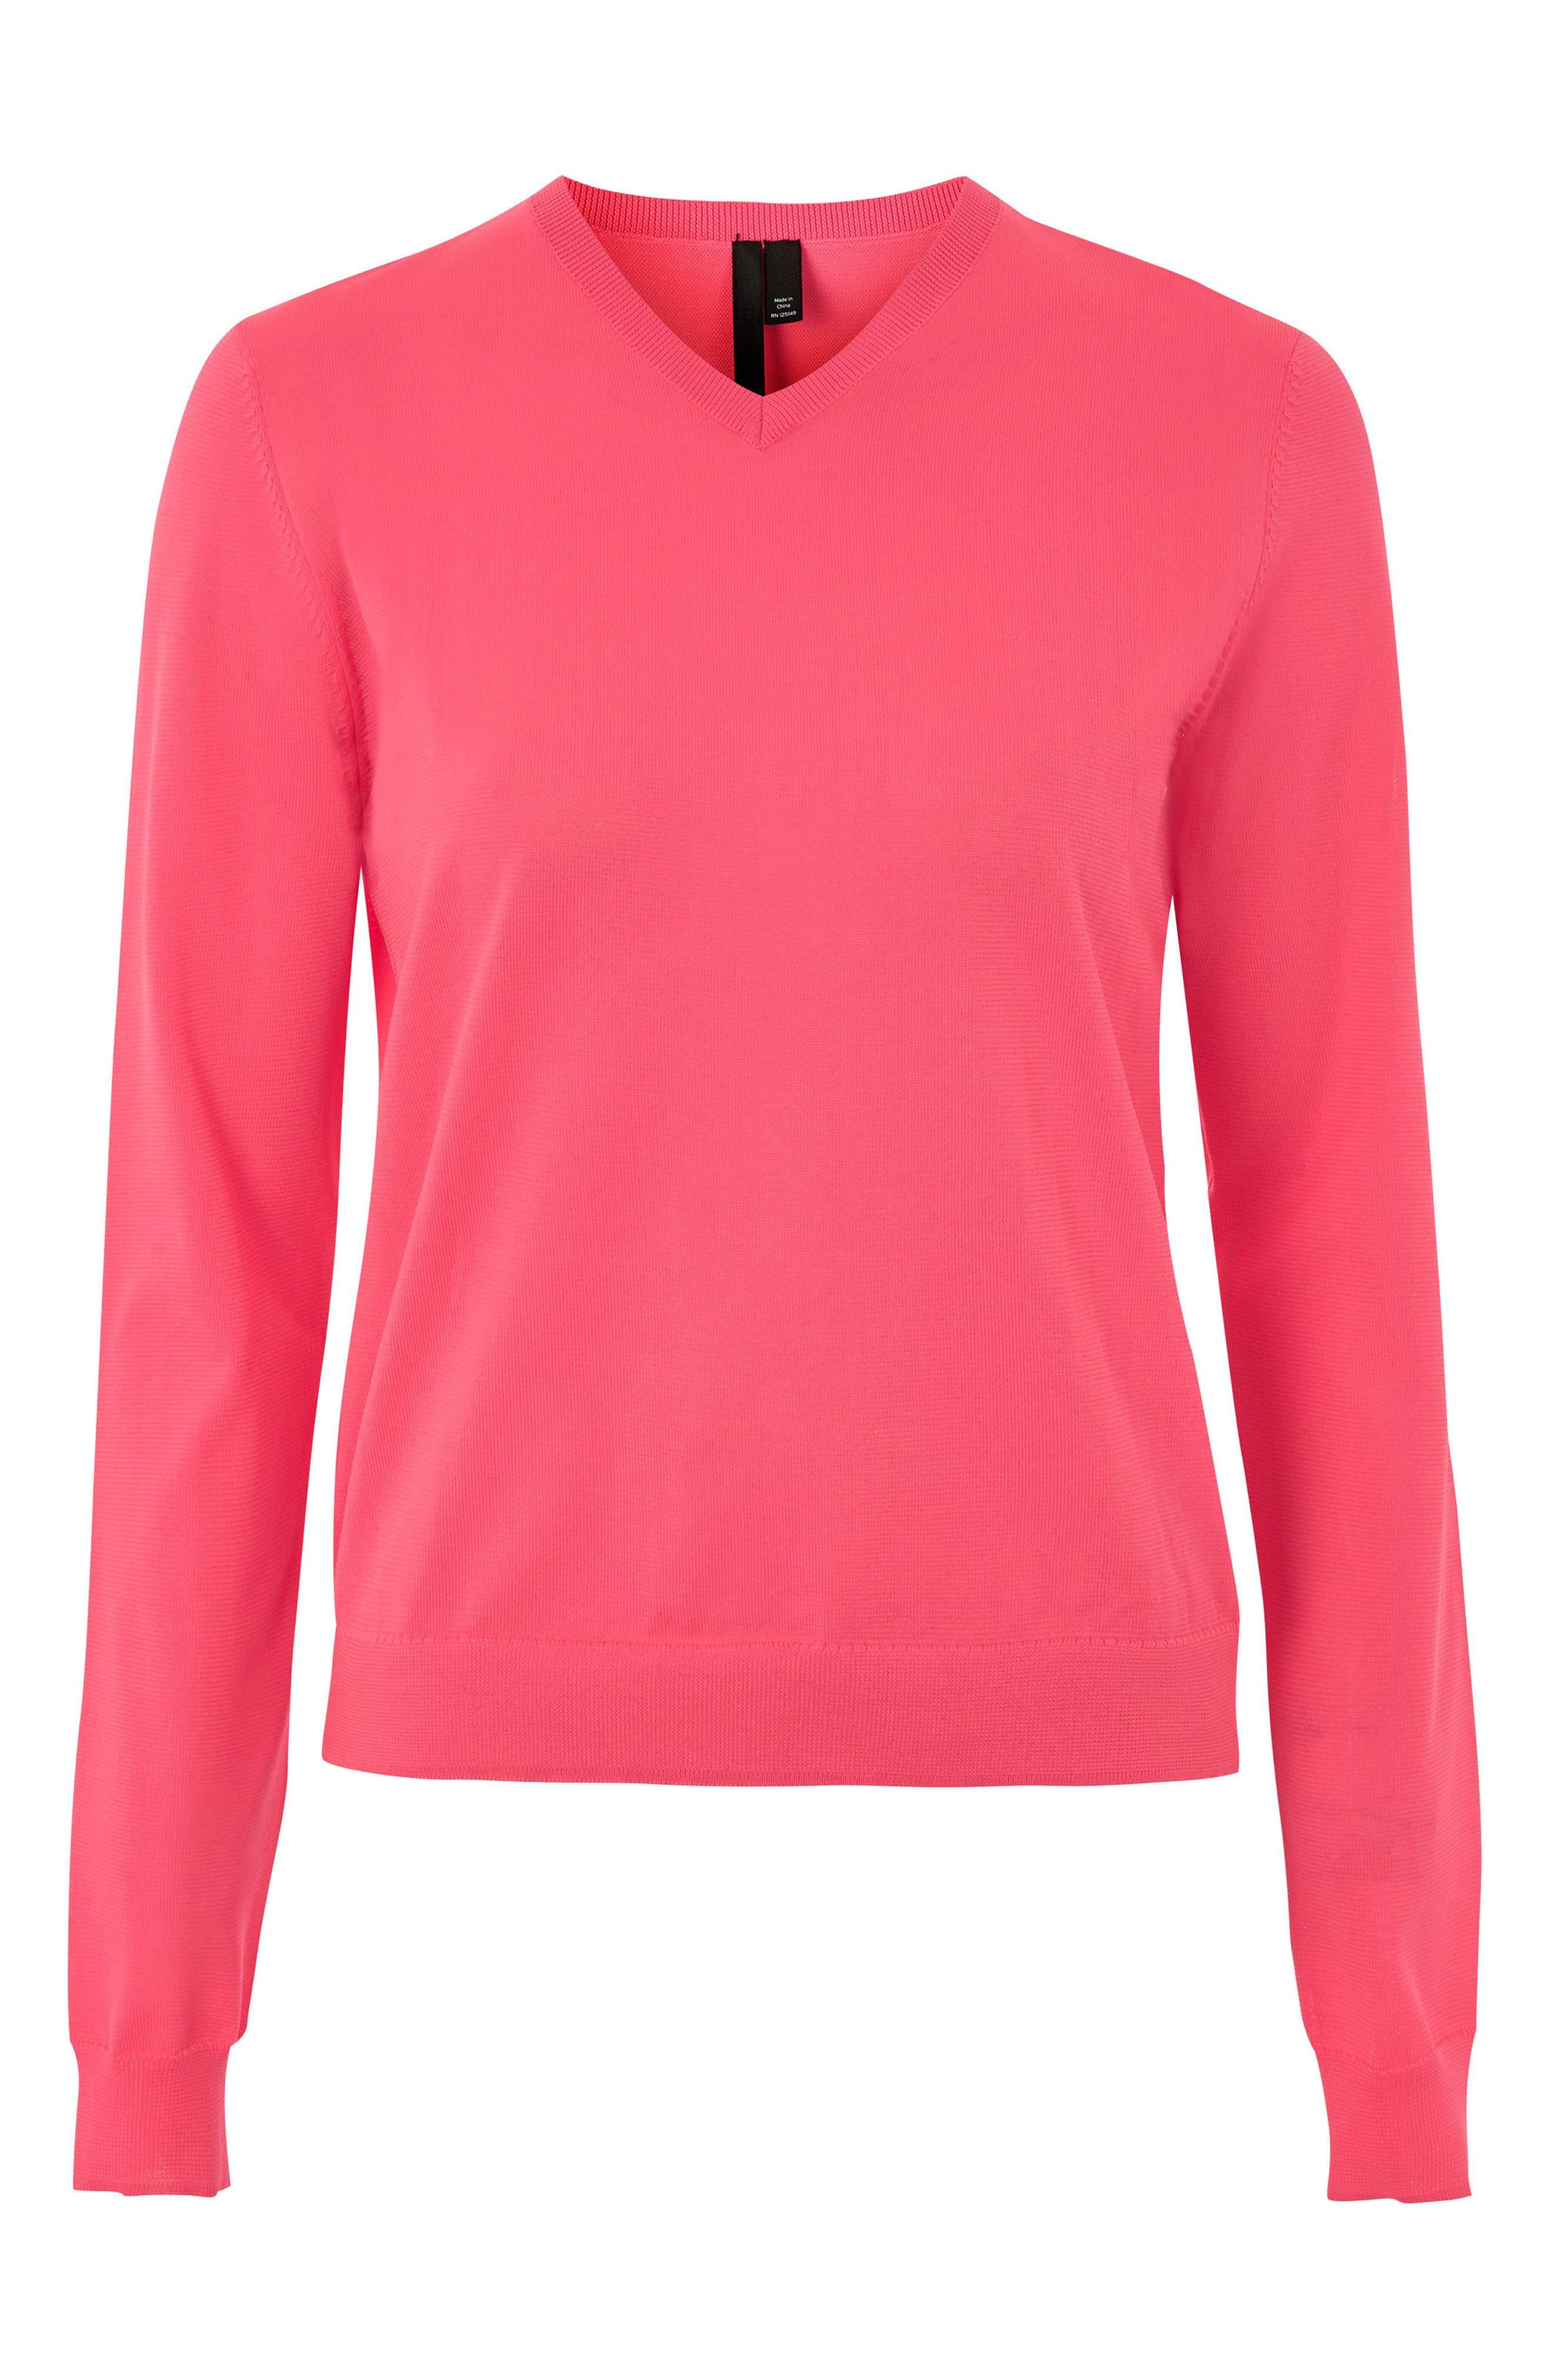 V-Neck Sweater,                             Main thumbnail 1, color,                             Bright Pink